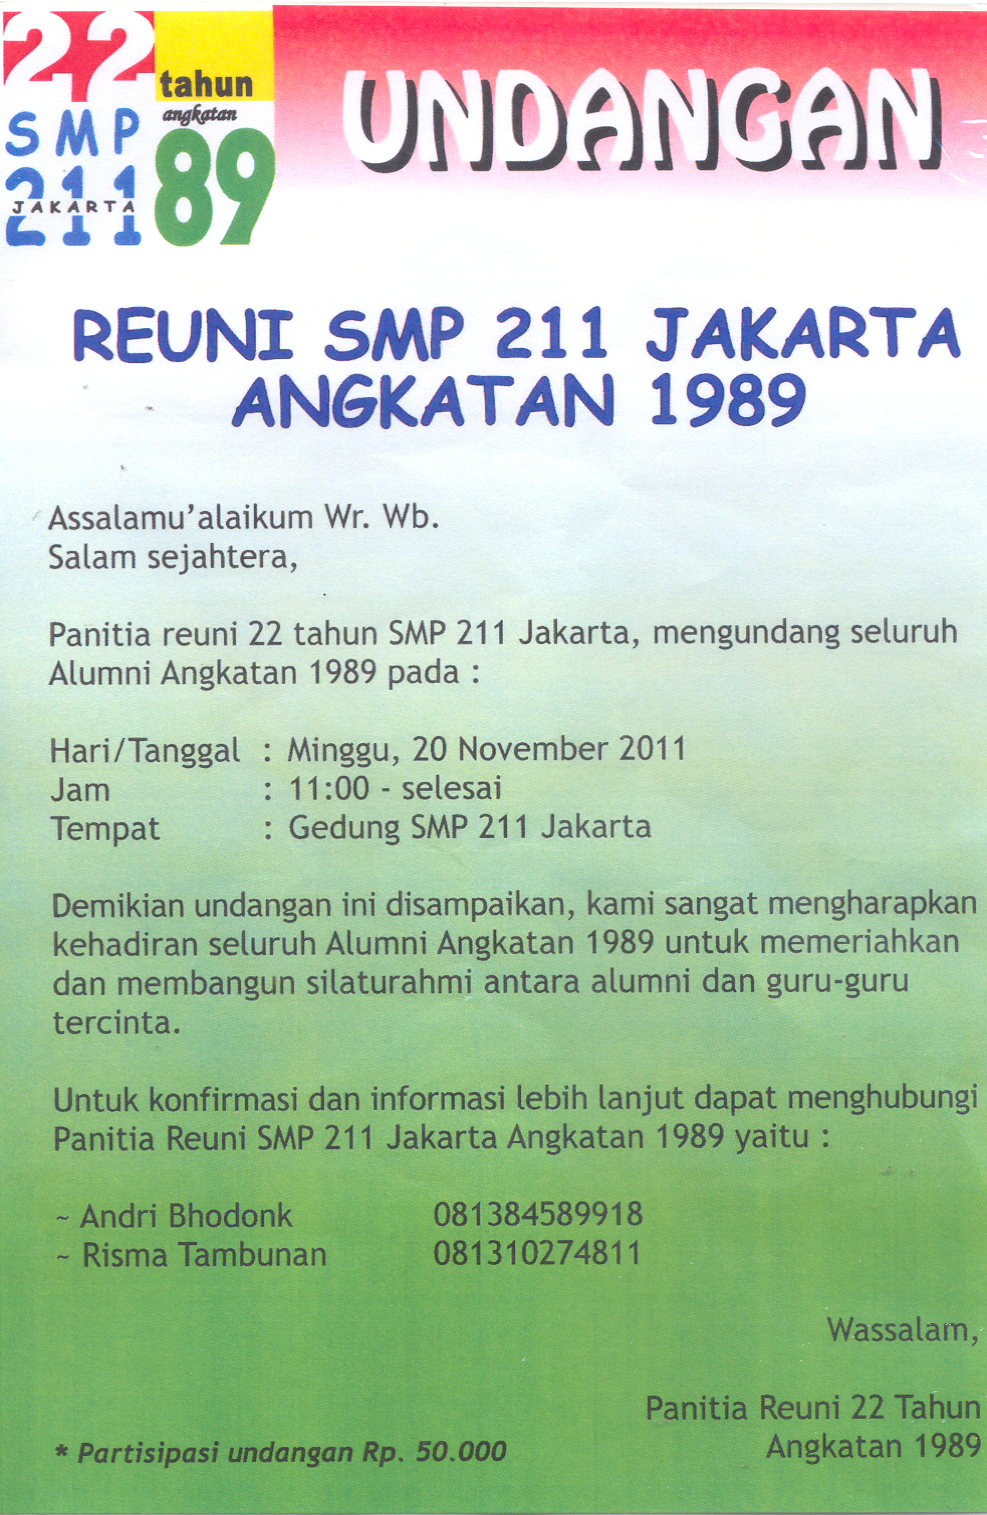 Undangan Reuni Dermaga71